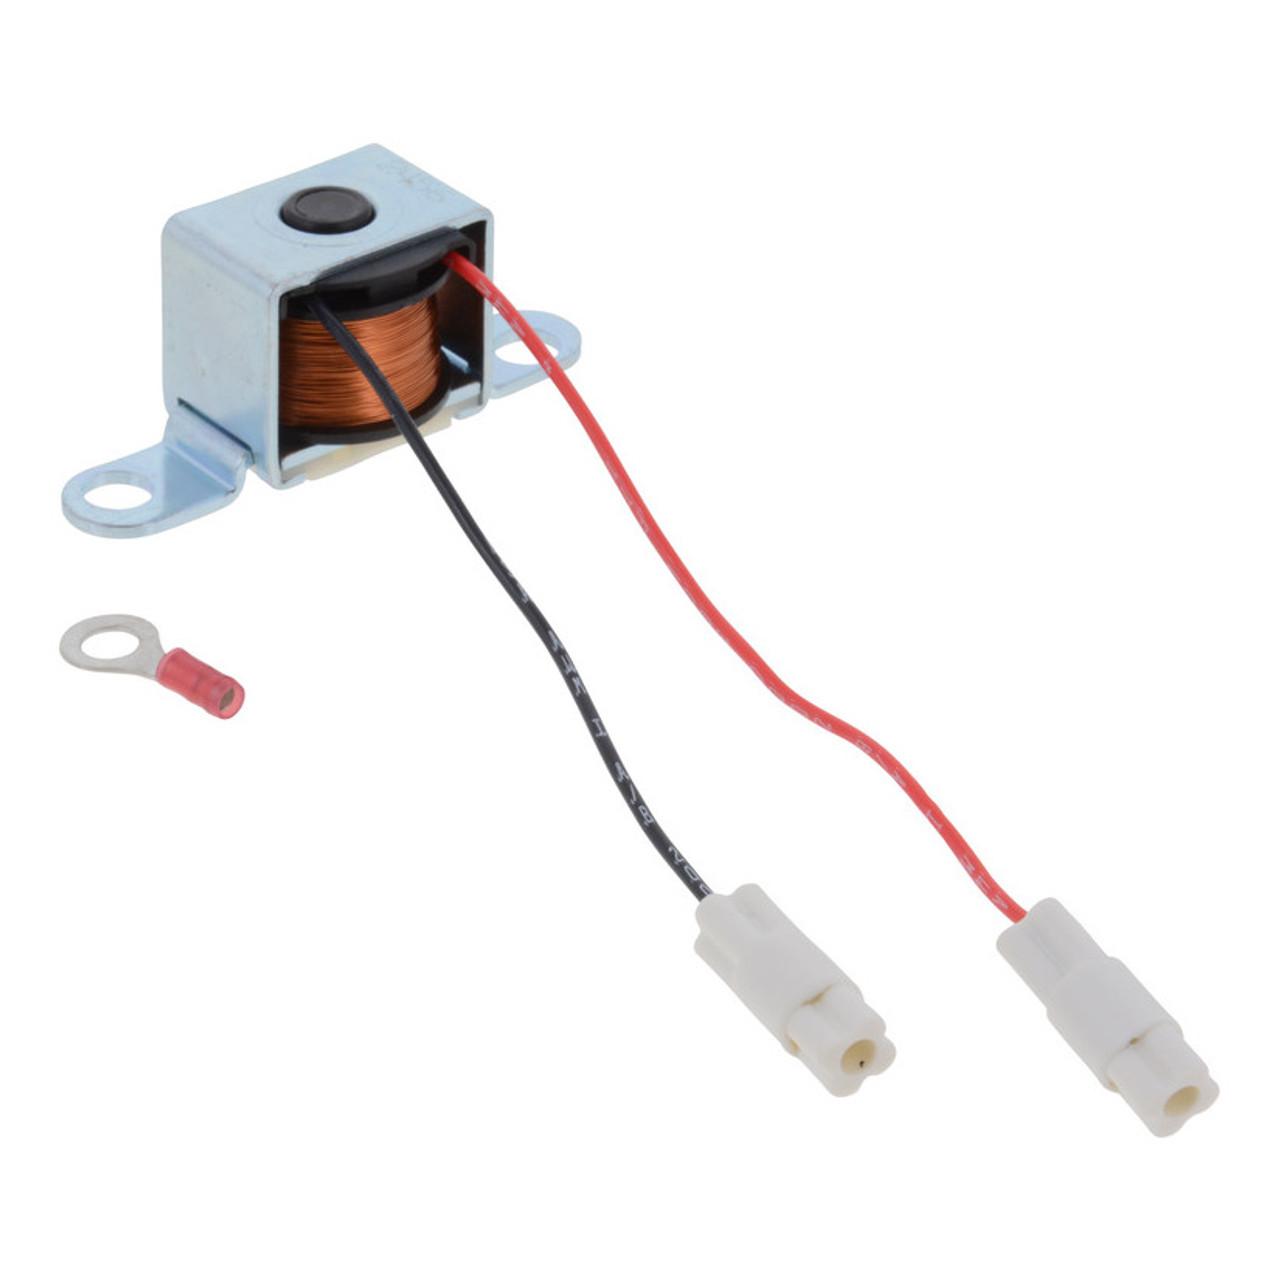 350 Th350 Transmission Lock